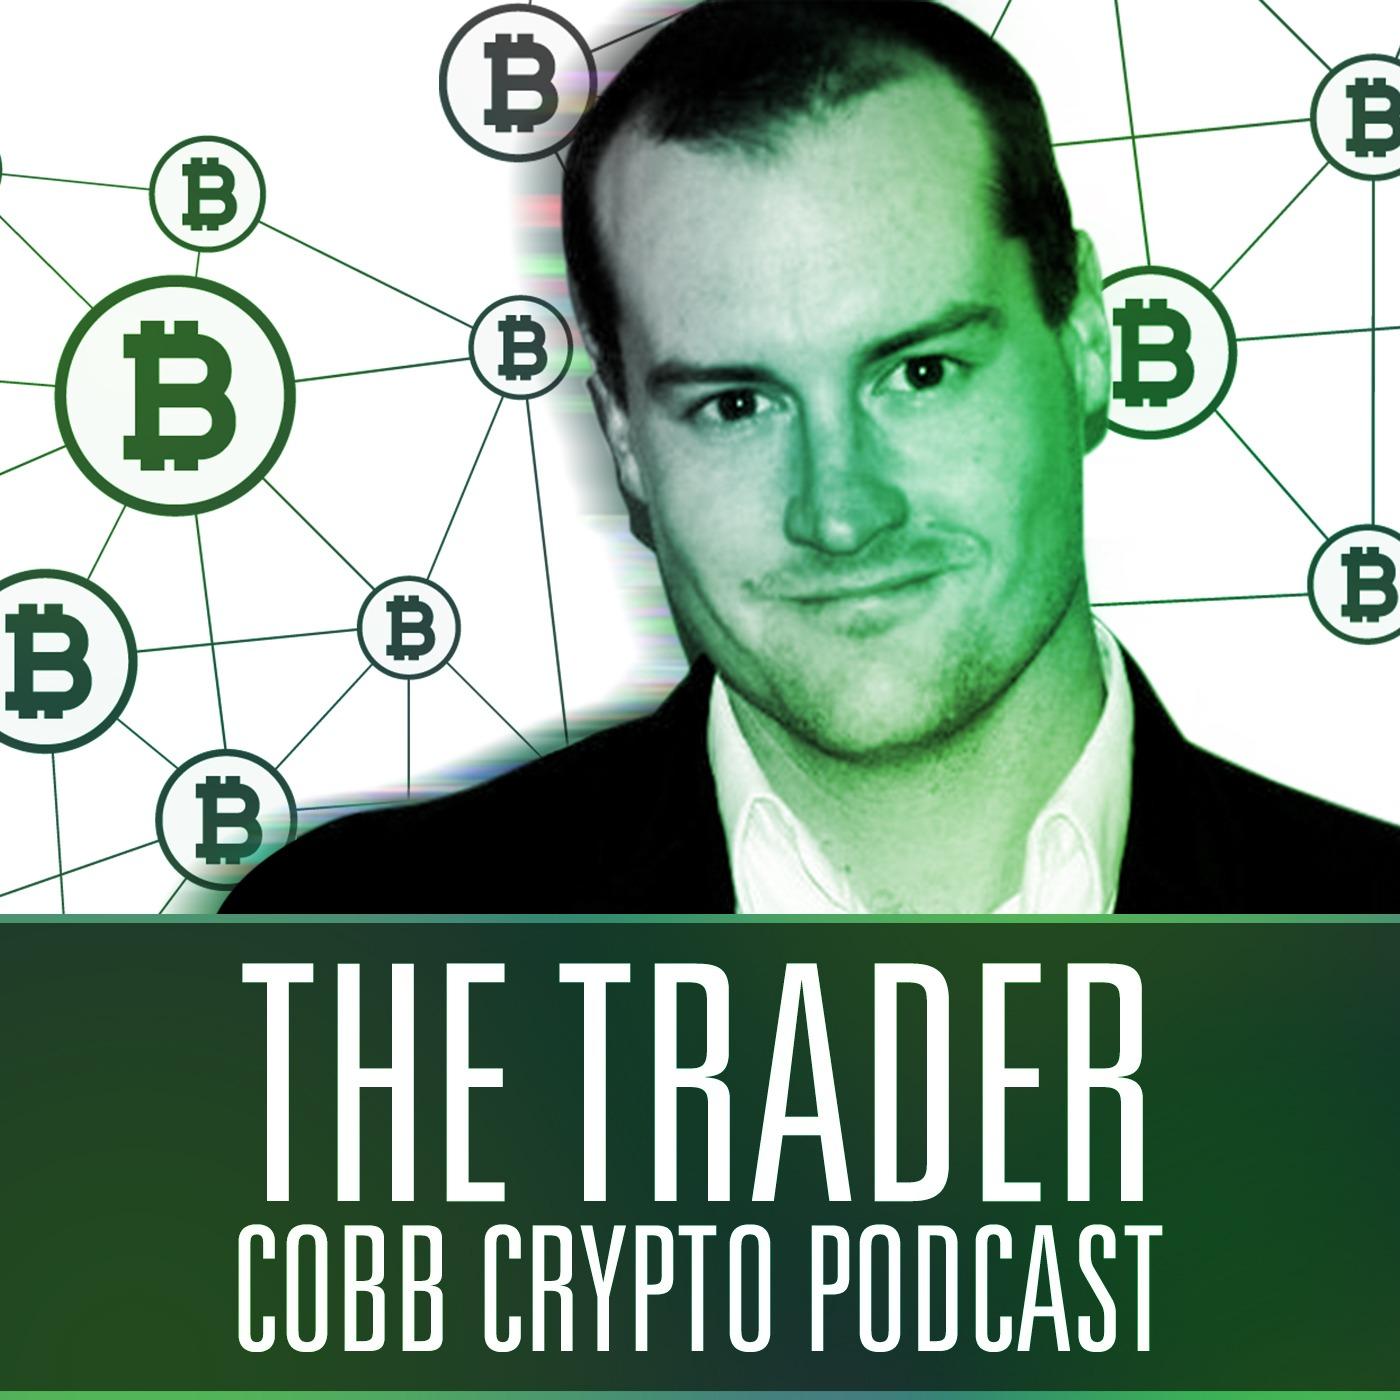 Bitcoin Tanks, The Market Tanks, Traders Trade